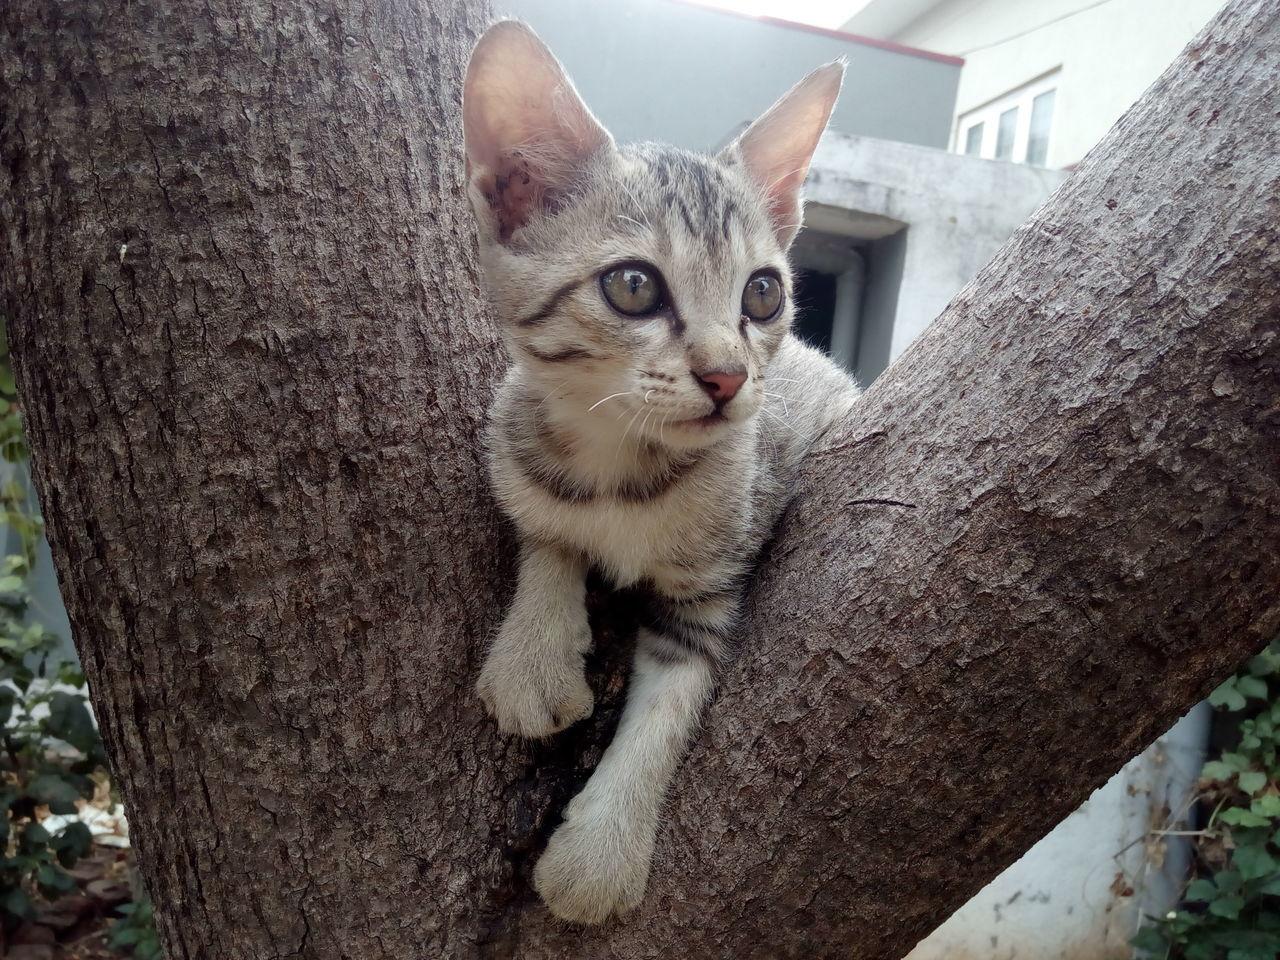 Beautiful stock photos of baby katzen, domestic cat, domestic animals, animal themes, pets